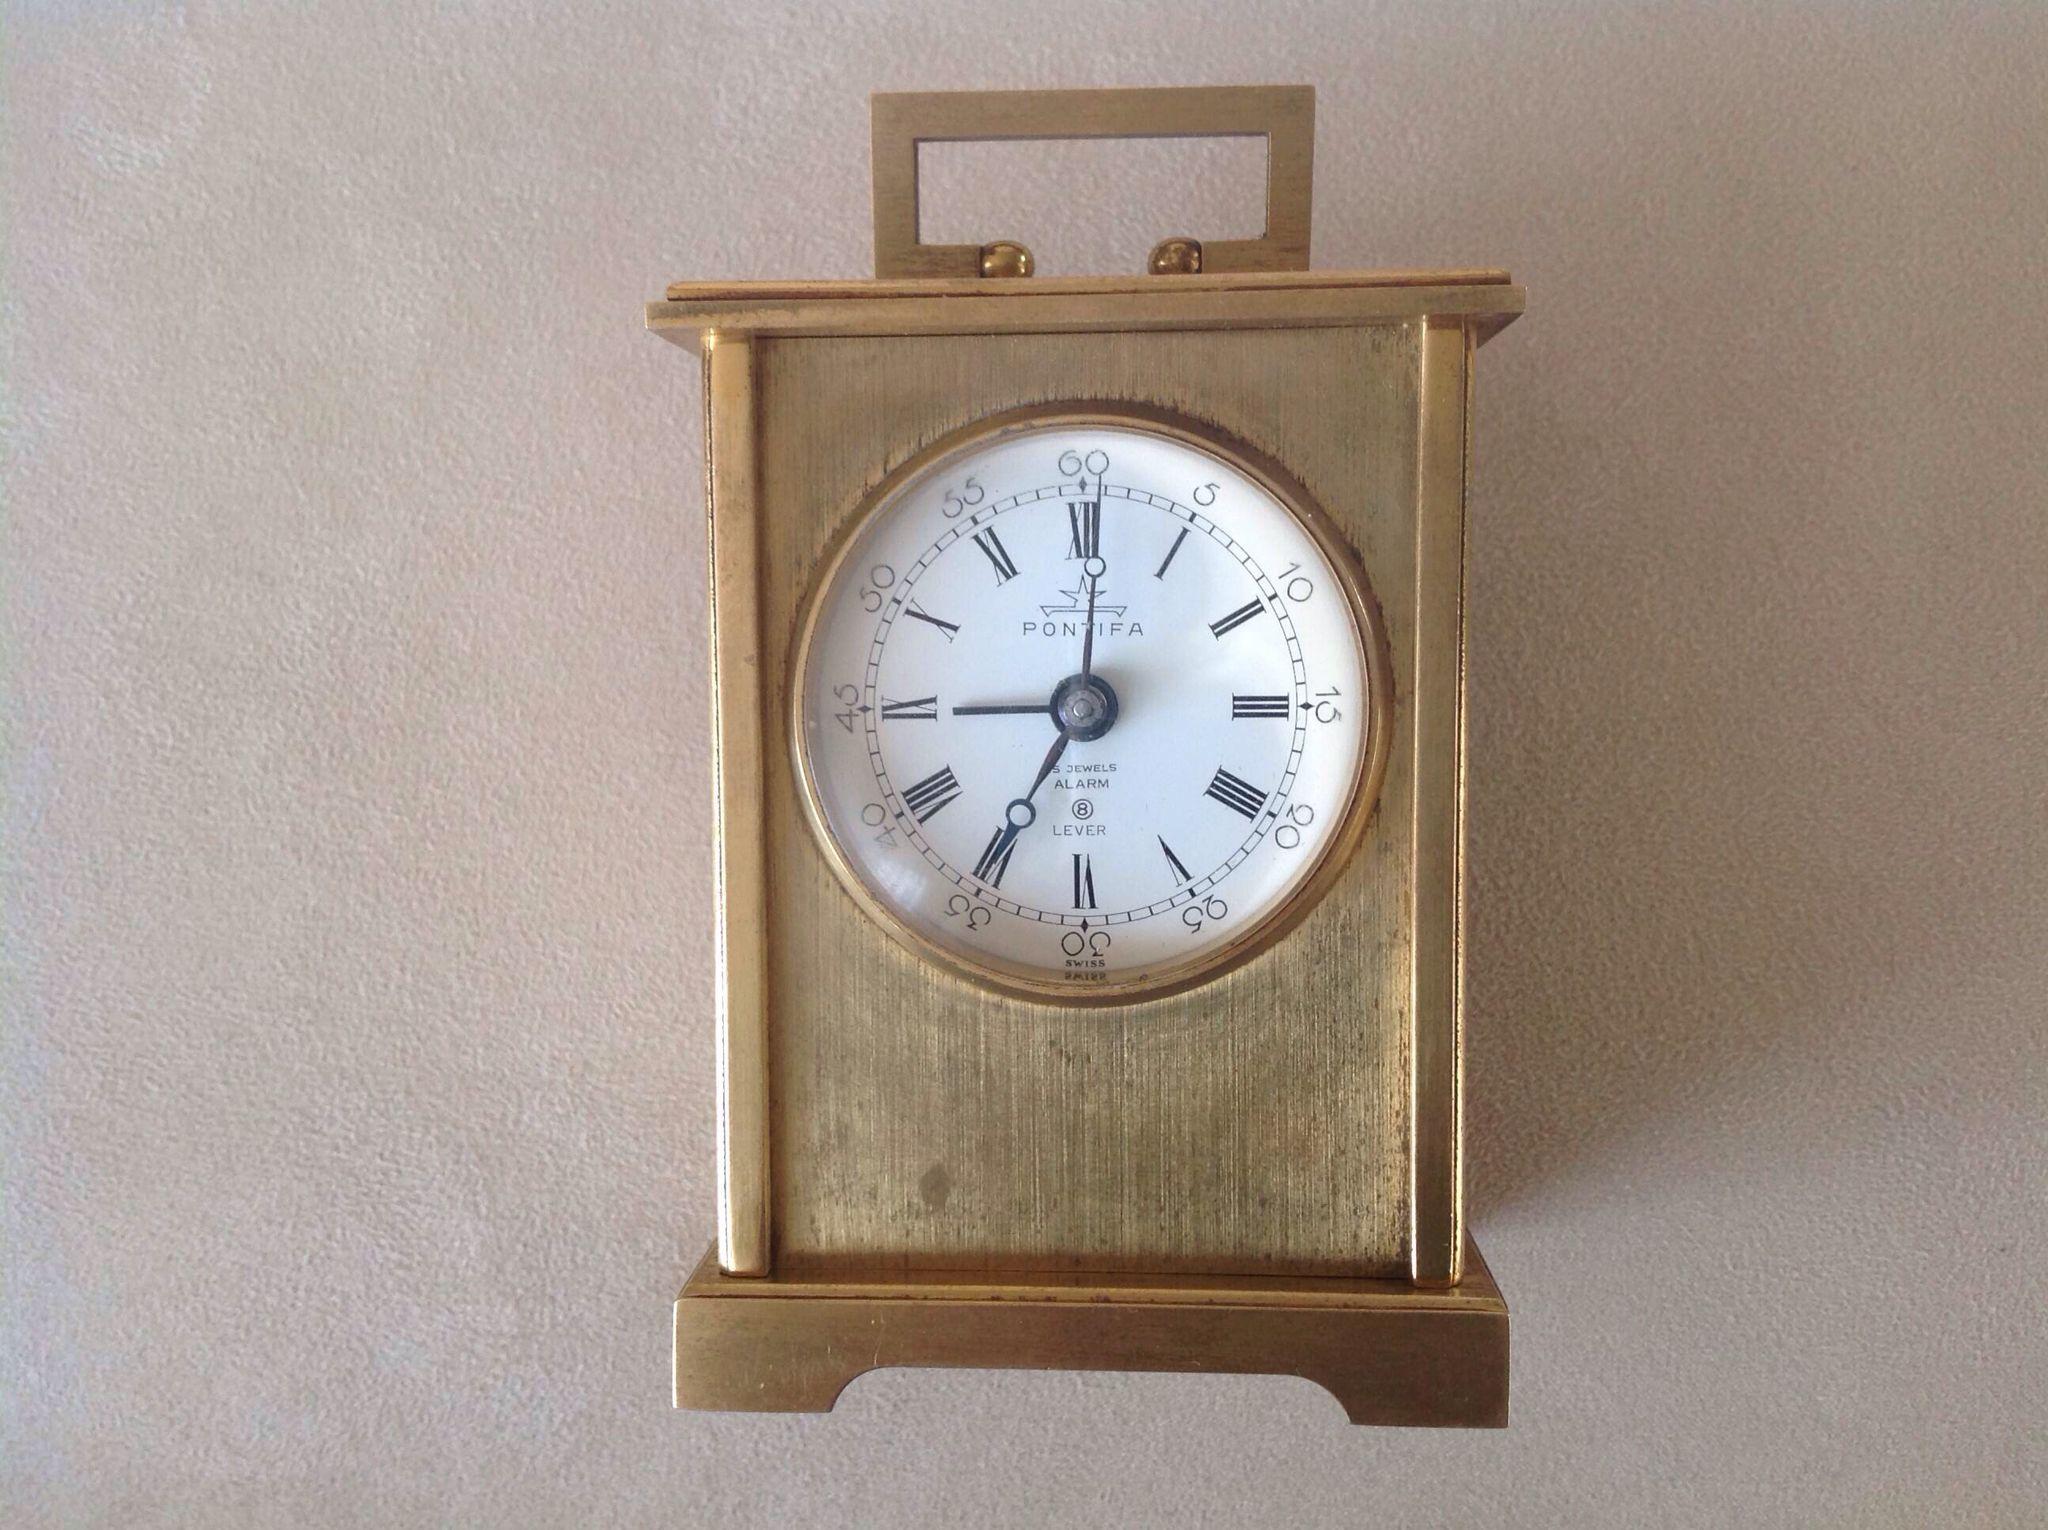 Pontifa alarm clock swiss made my clocks saatlerim pontifa alarm clock swiss made amipublicfo Gallery